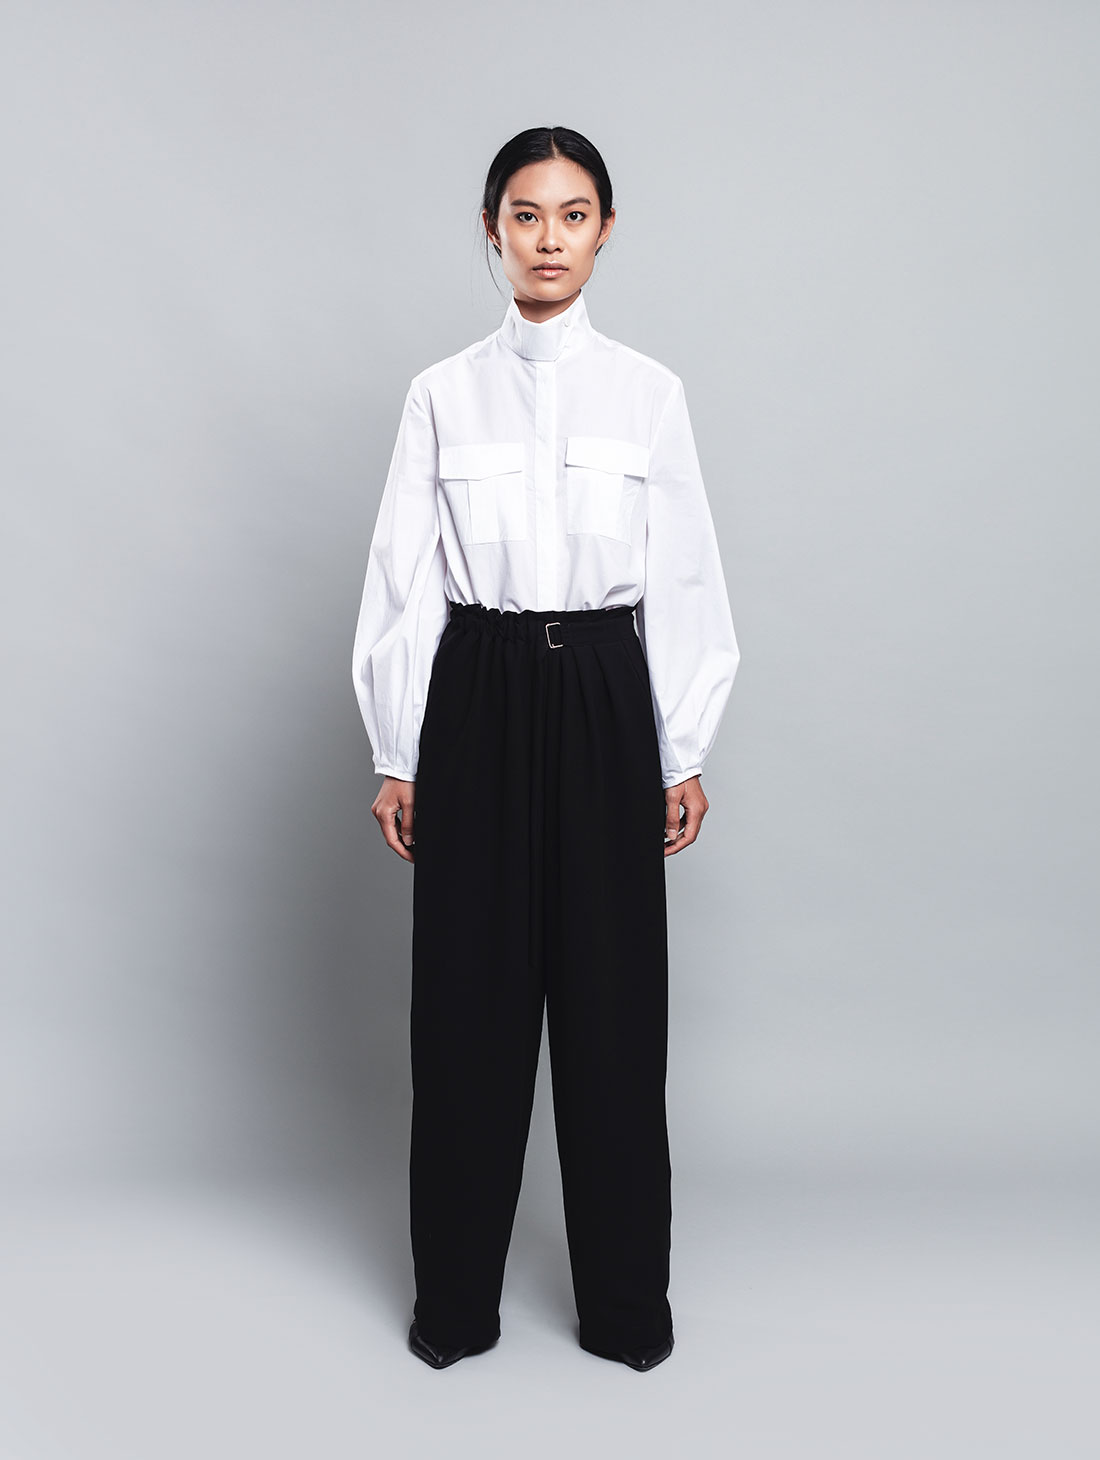 Rigel – Pantalone Nero in Microfibra, Gamba Morbida